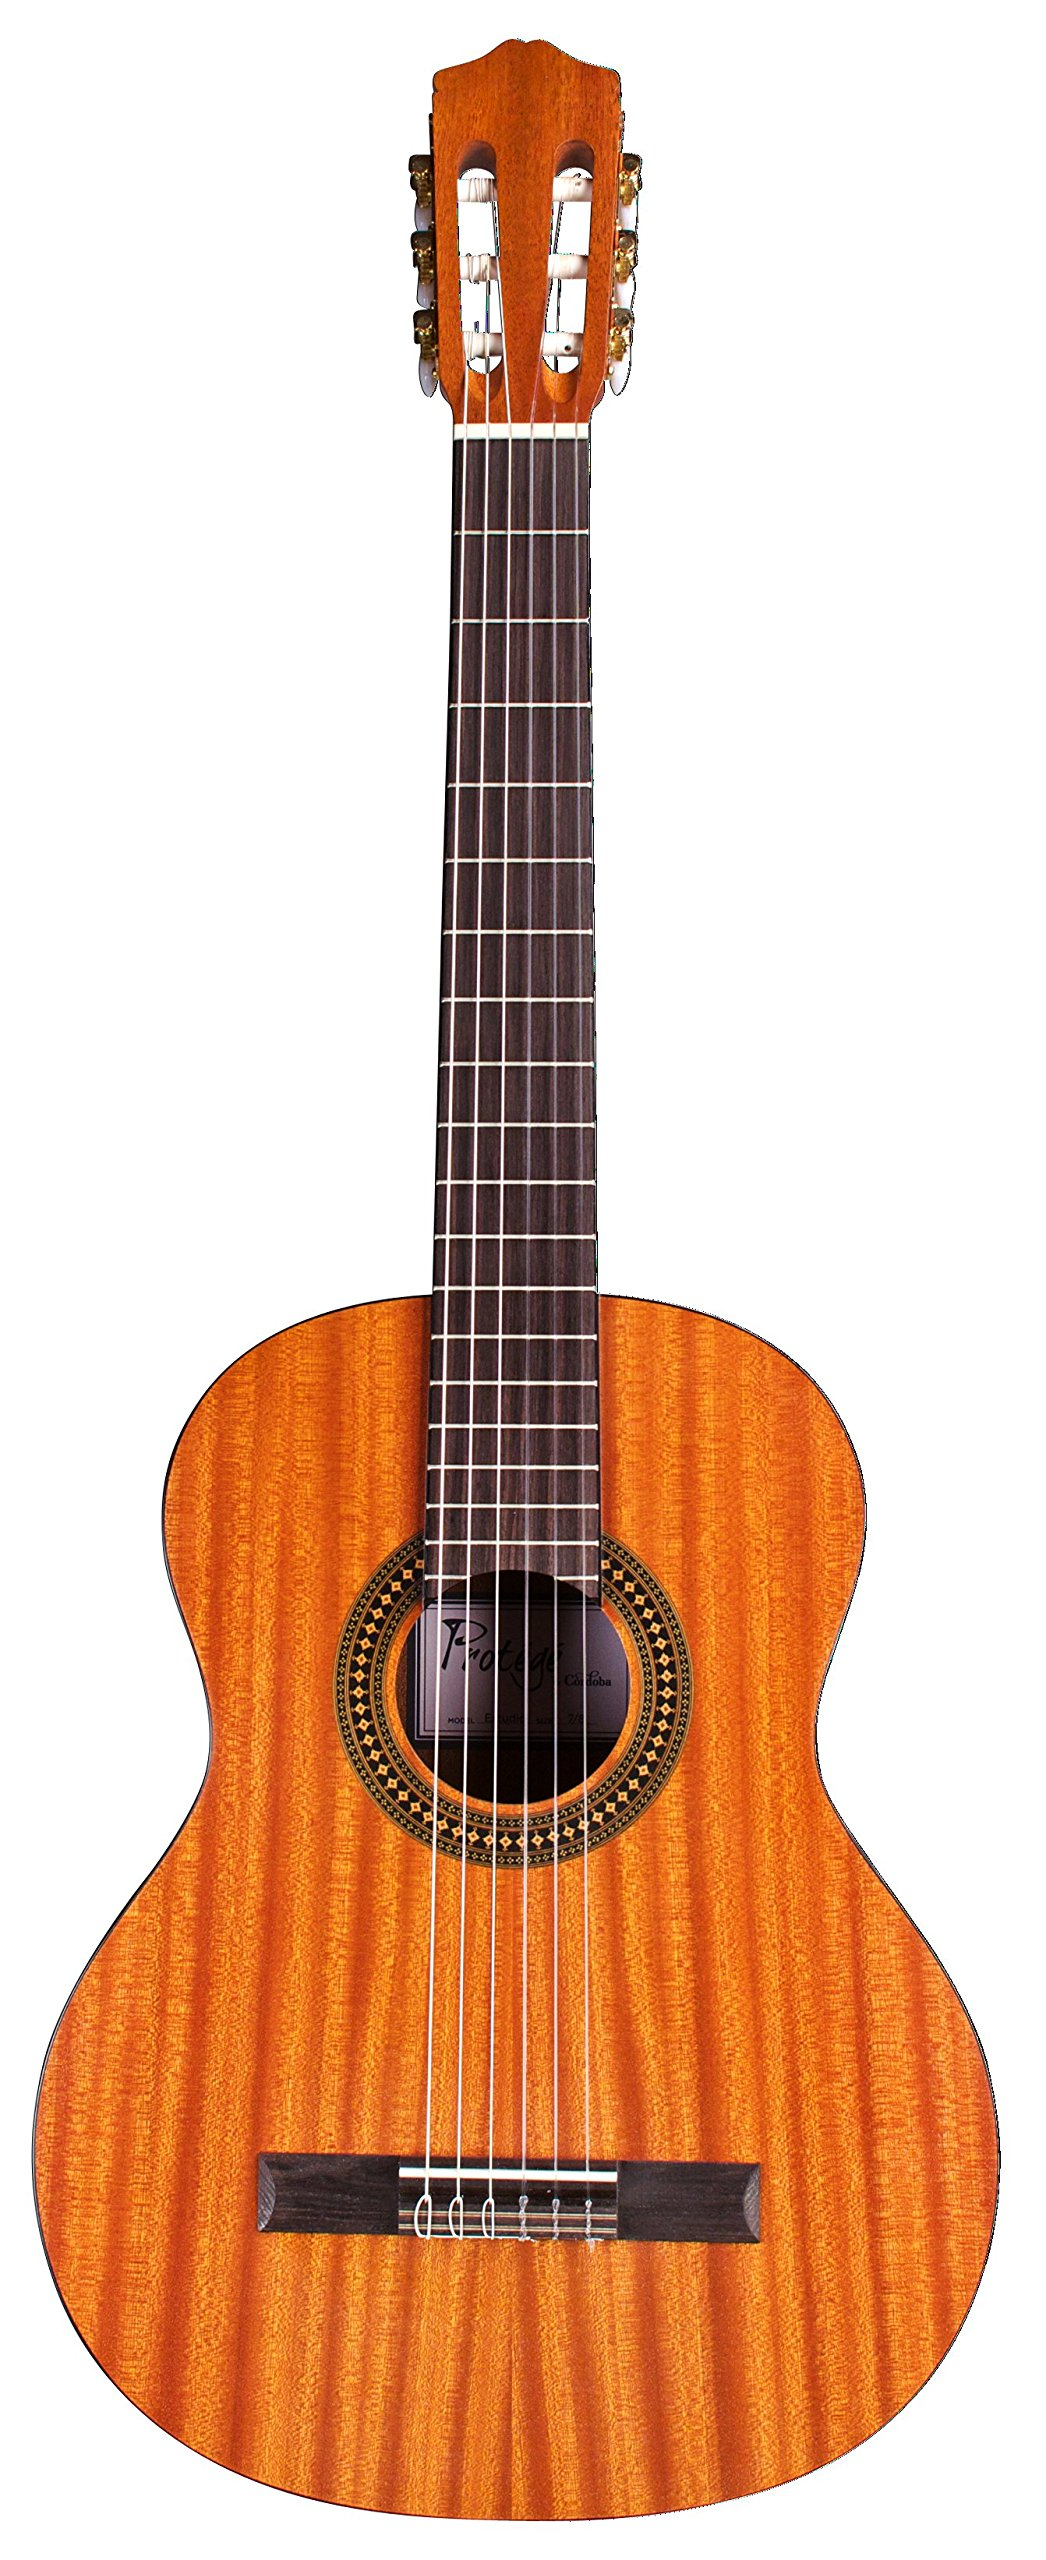 Cordoba Guitars Estudio 7/8 scale Classical guitar